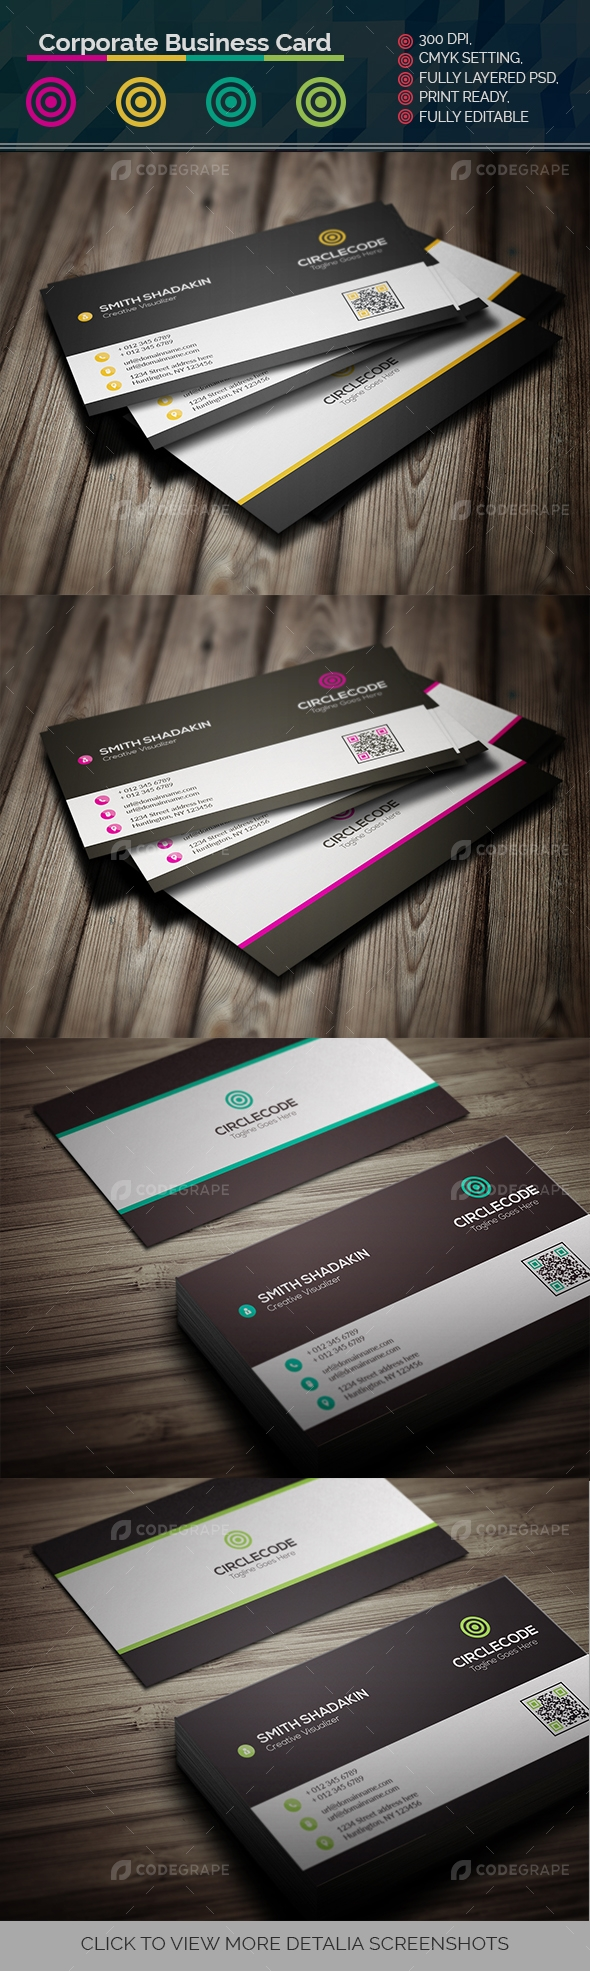 Corporate Business Card Vol.2